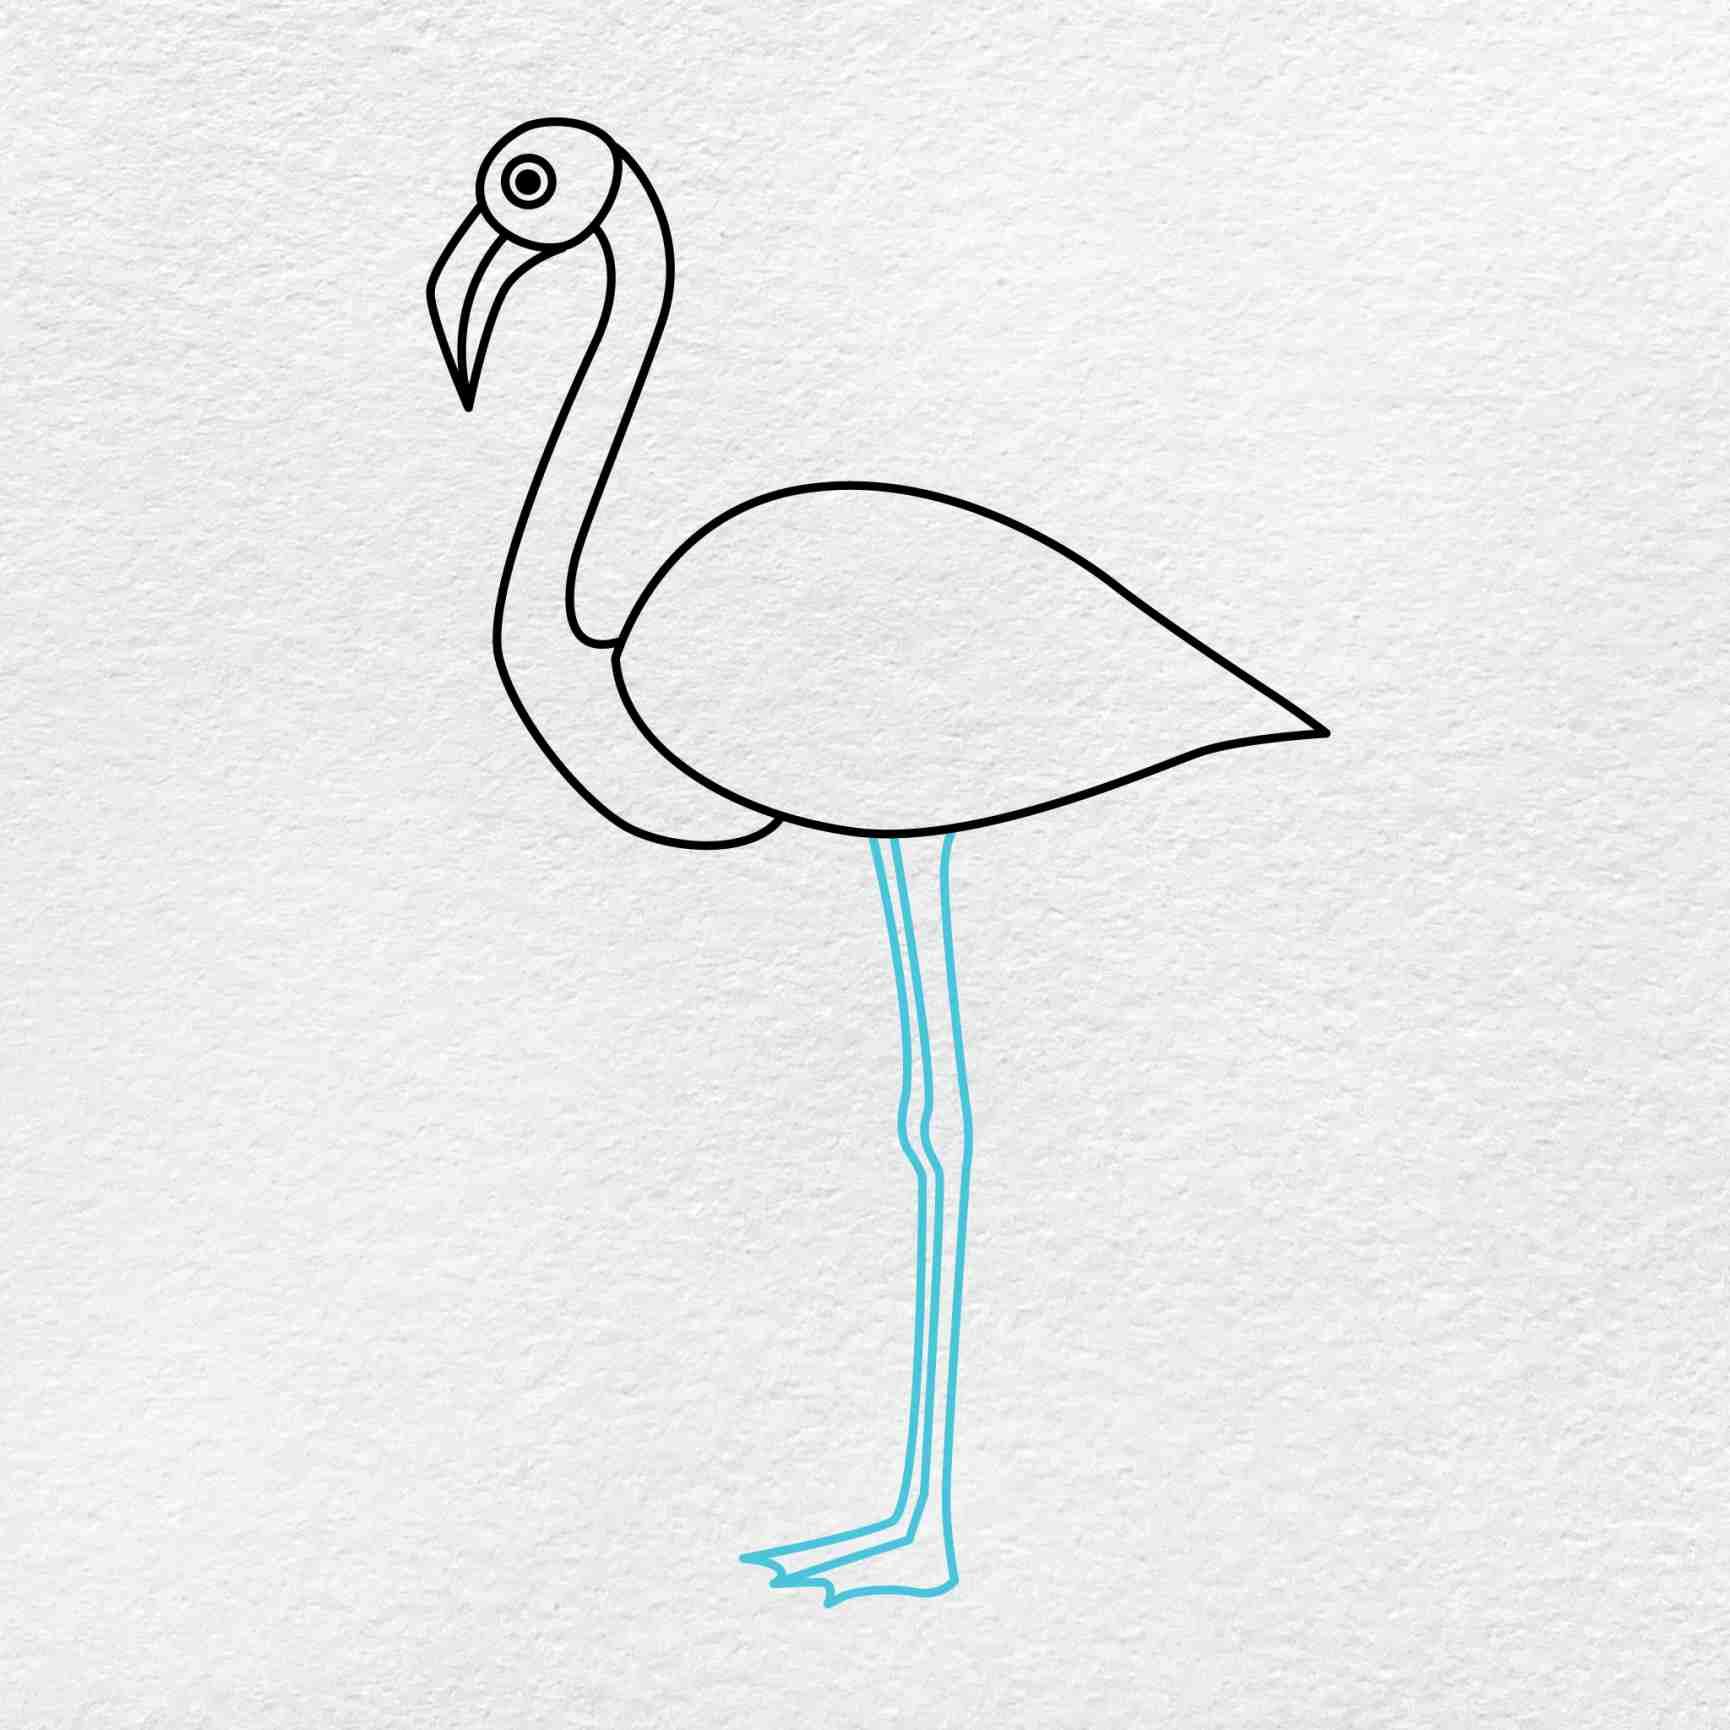 Flamingo Drawing: Step 4